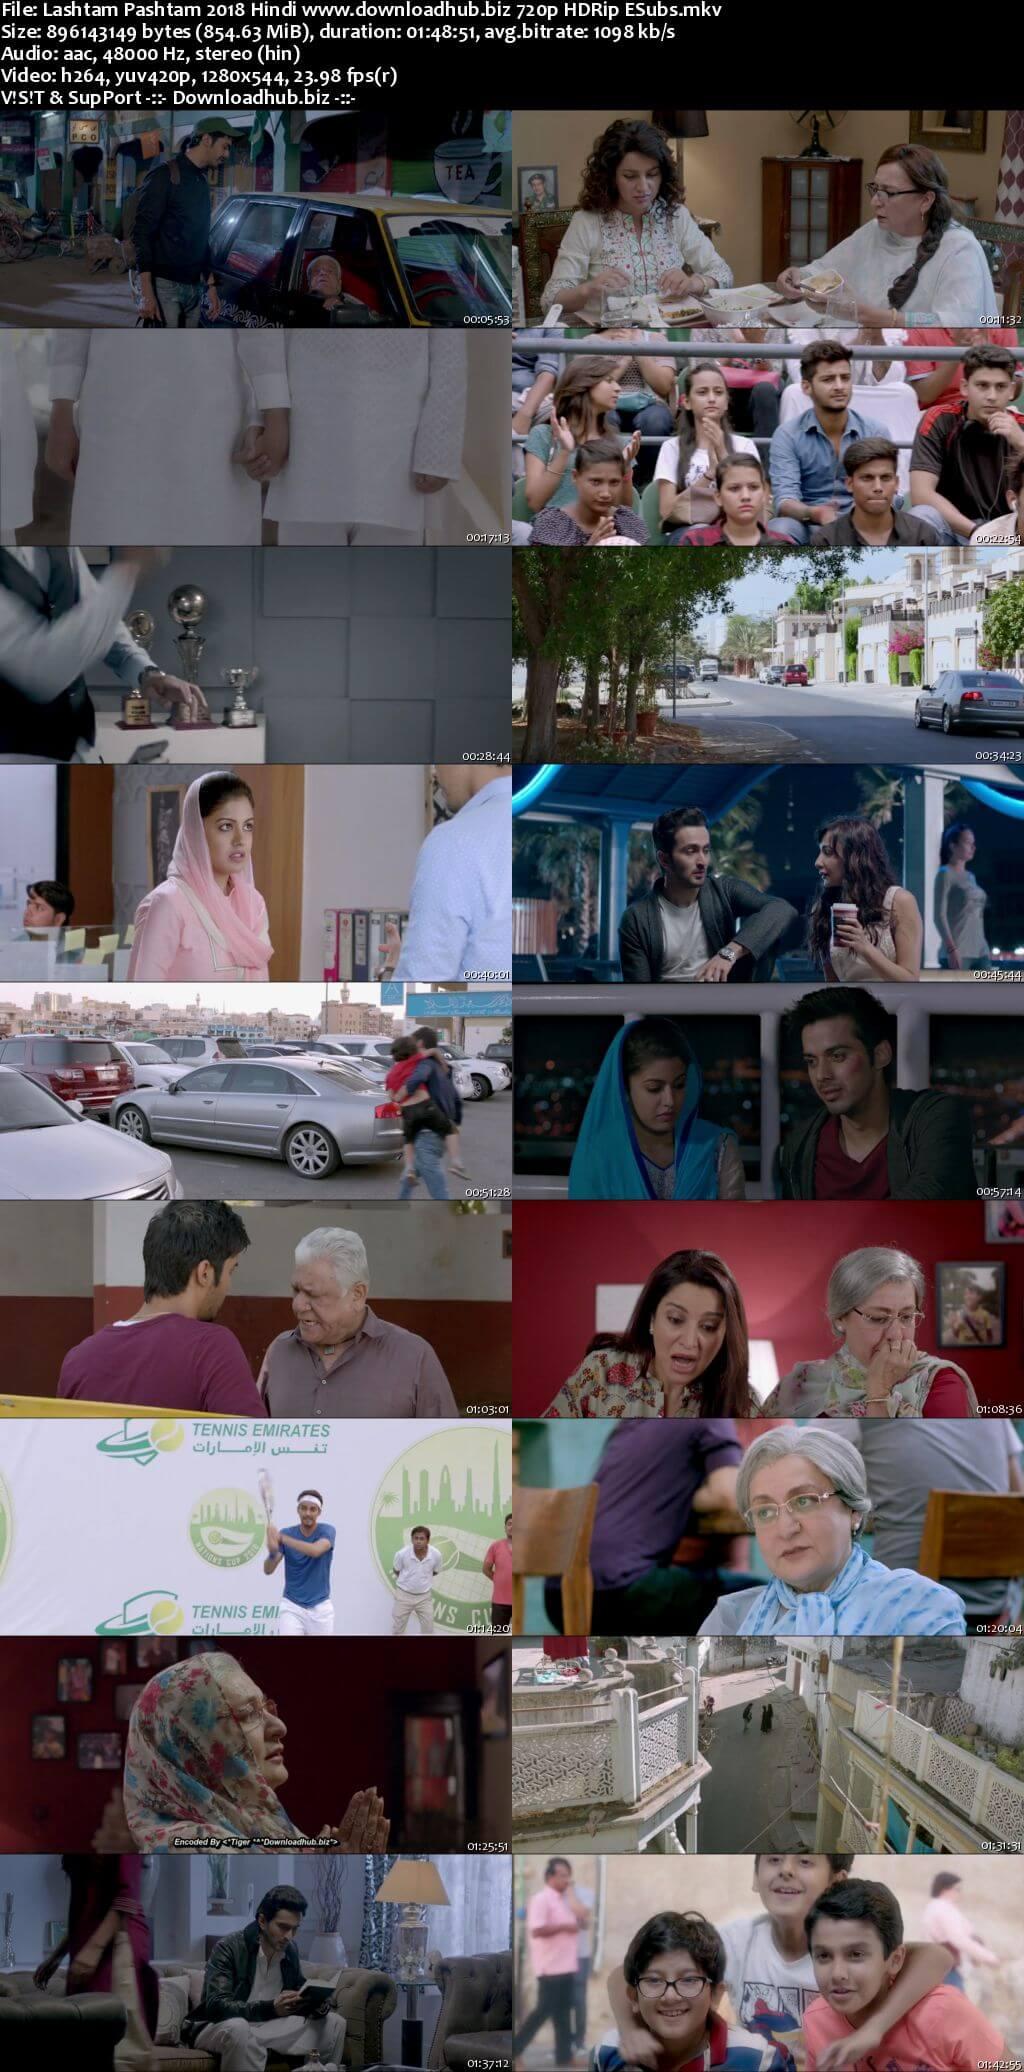 Lashtam Pashtam 2018 Hindi 720p HDRip ESubs